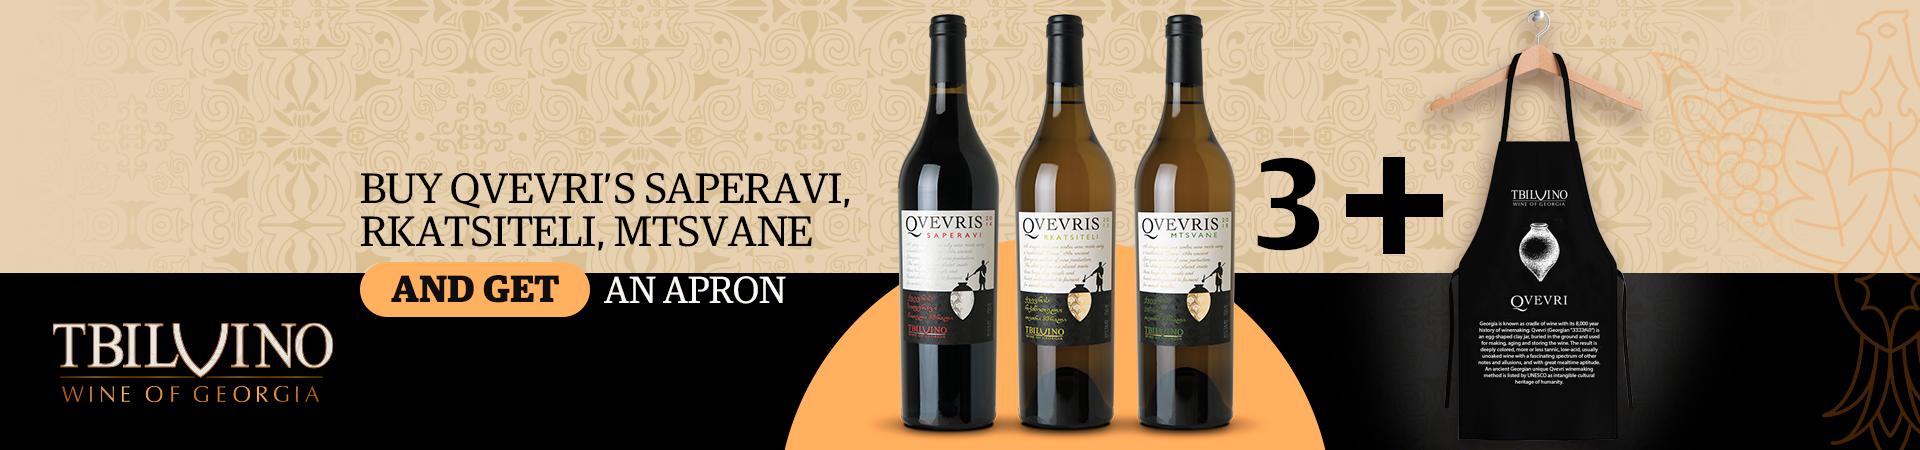 Tbilvino-3-qvevry-wine-+-apron-1920X450-Eng